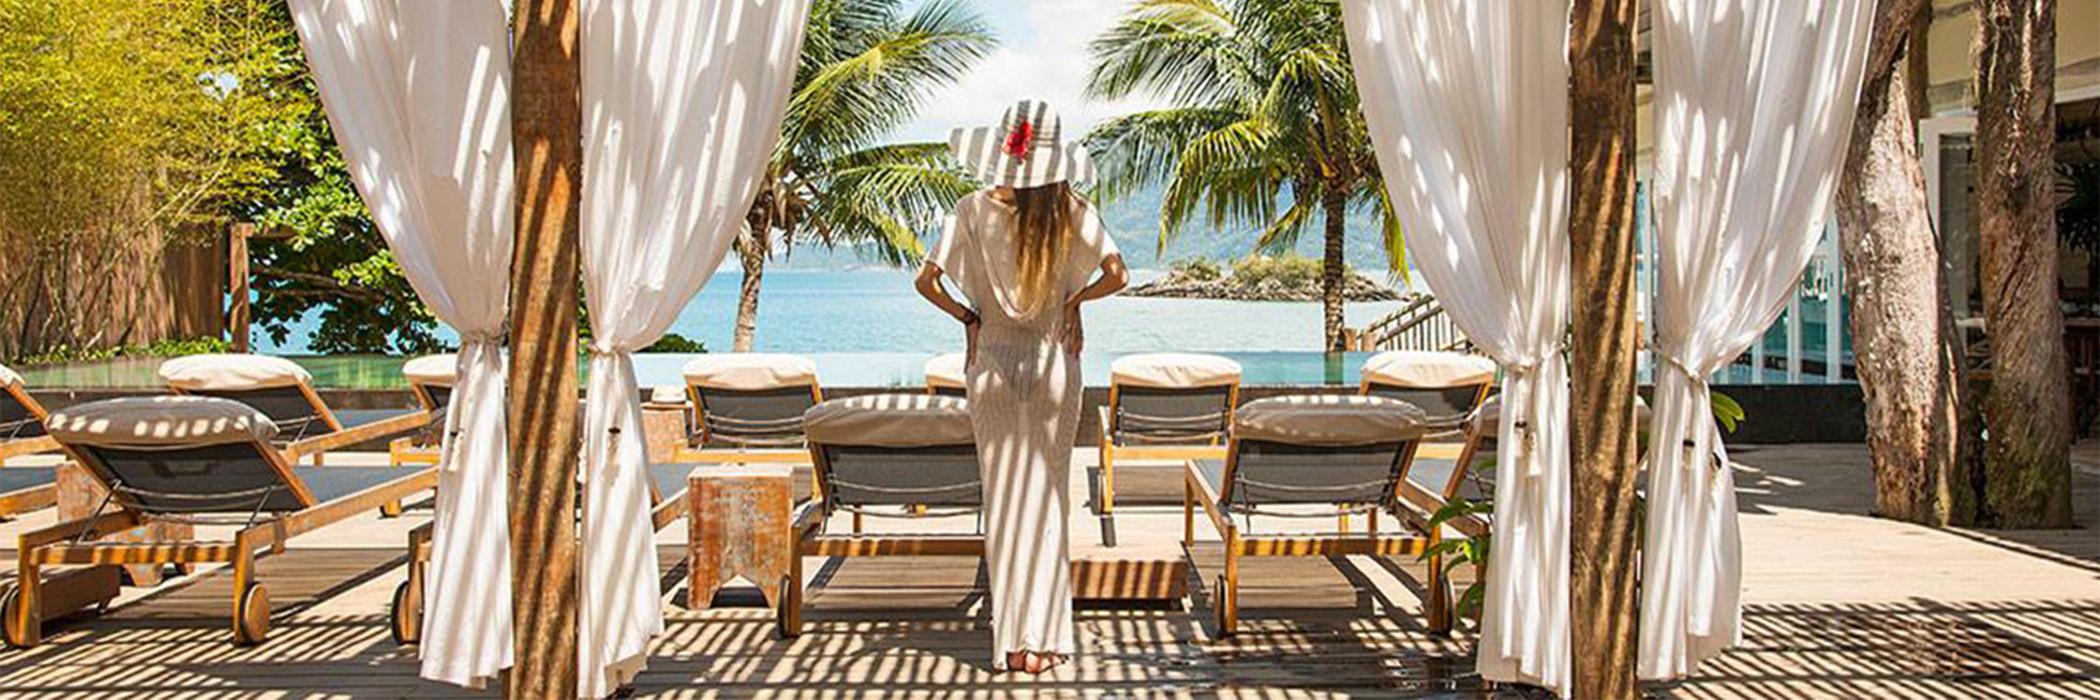 TW GUAIMBÊ EXCLUSIVE SUITES HOTEL= mulher de branco em pé ao lado de 2 tendas brancas